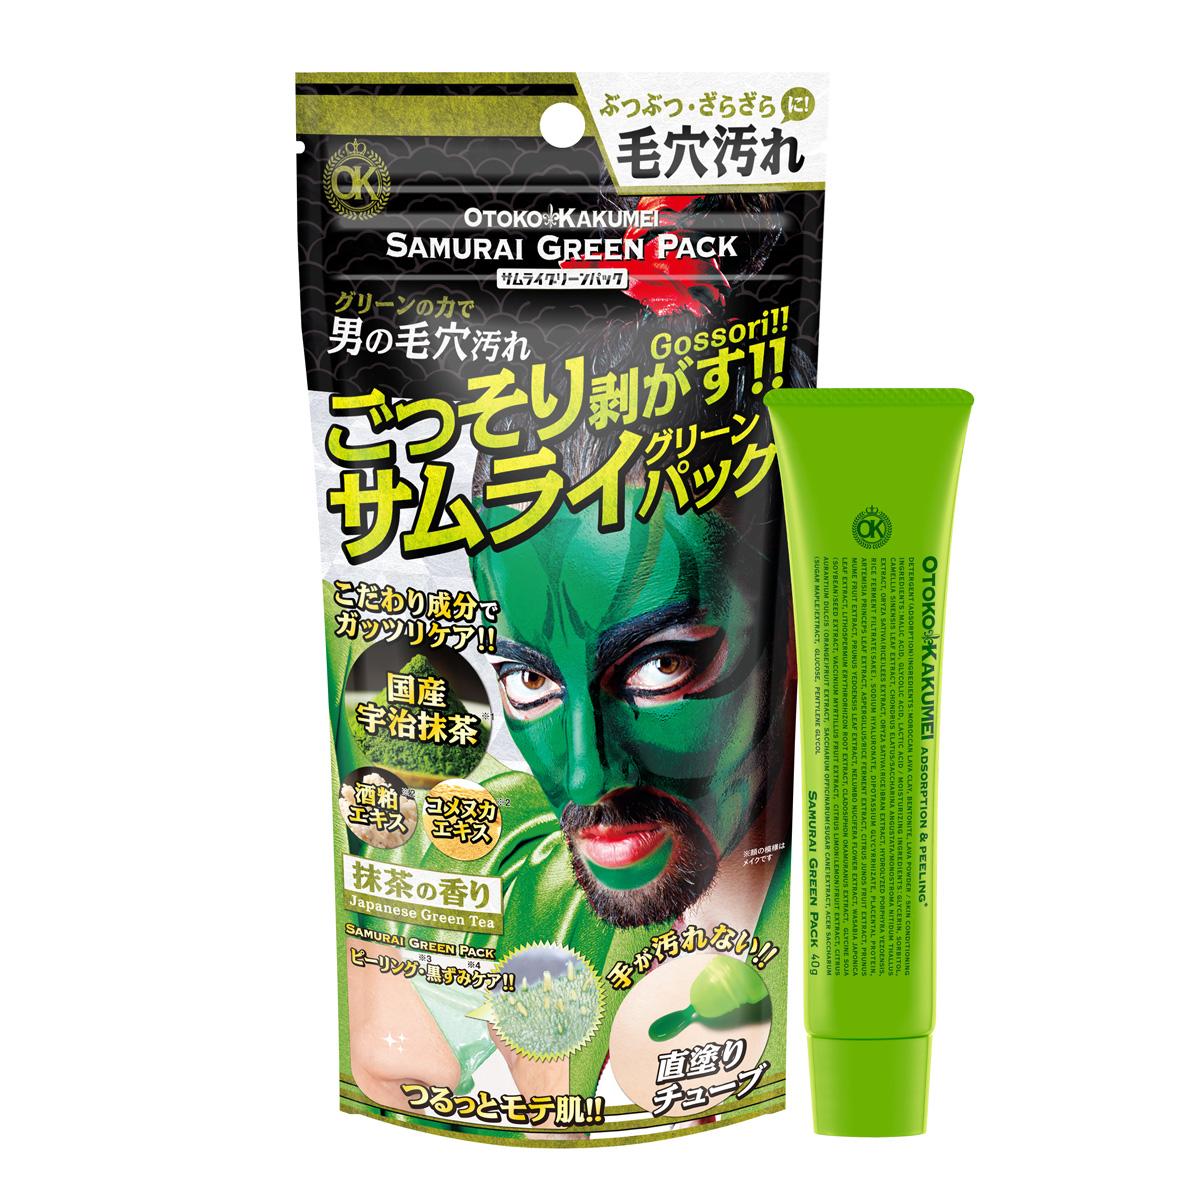 OTOKO KAKUMEI SAMURAI GREEN PACK